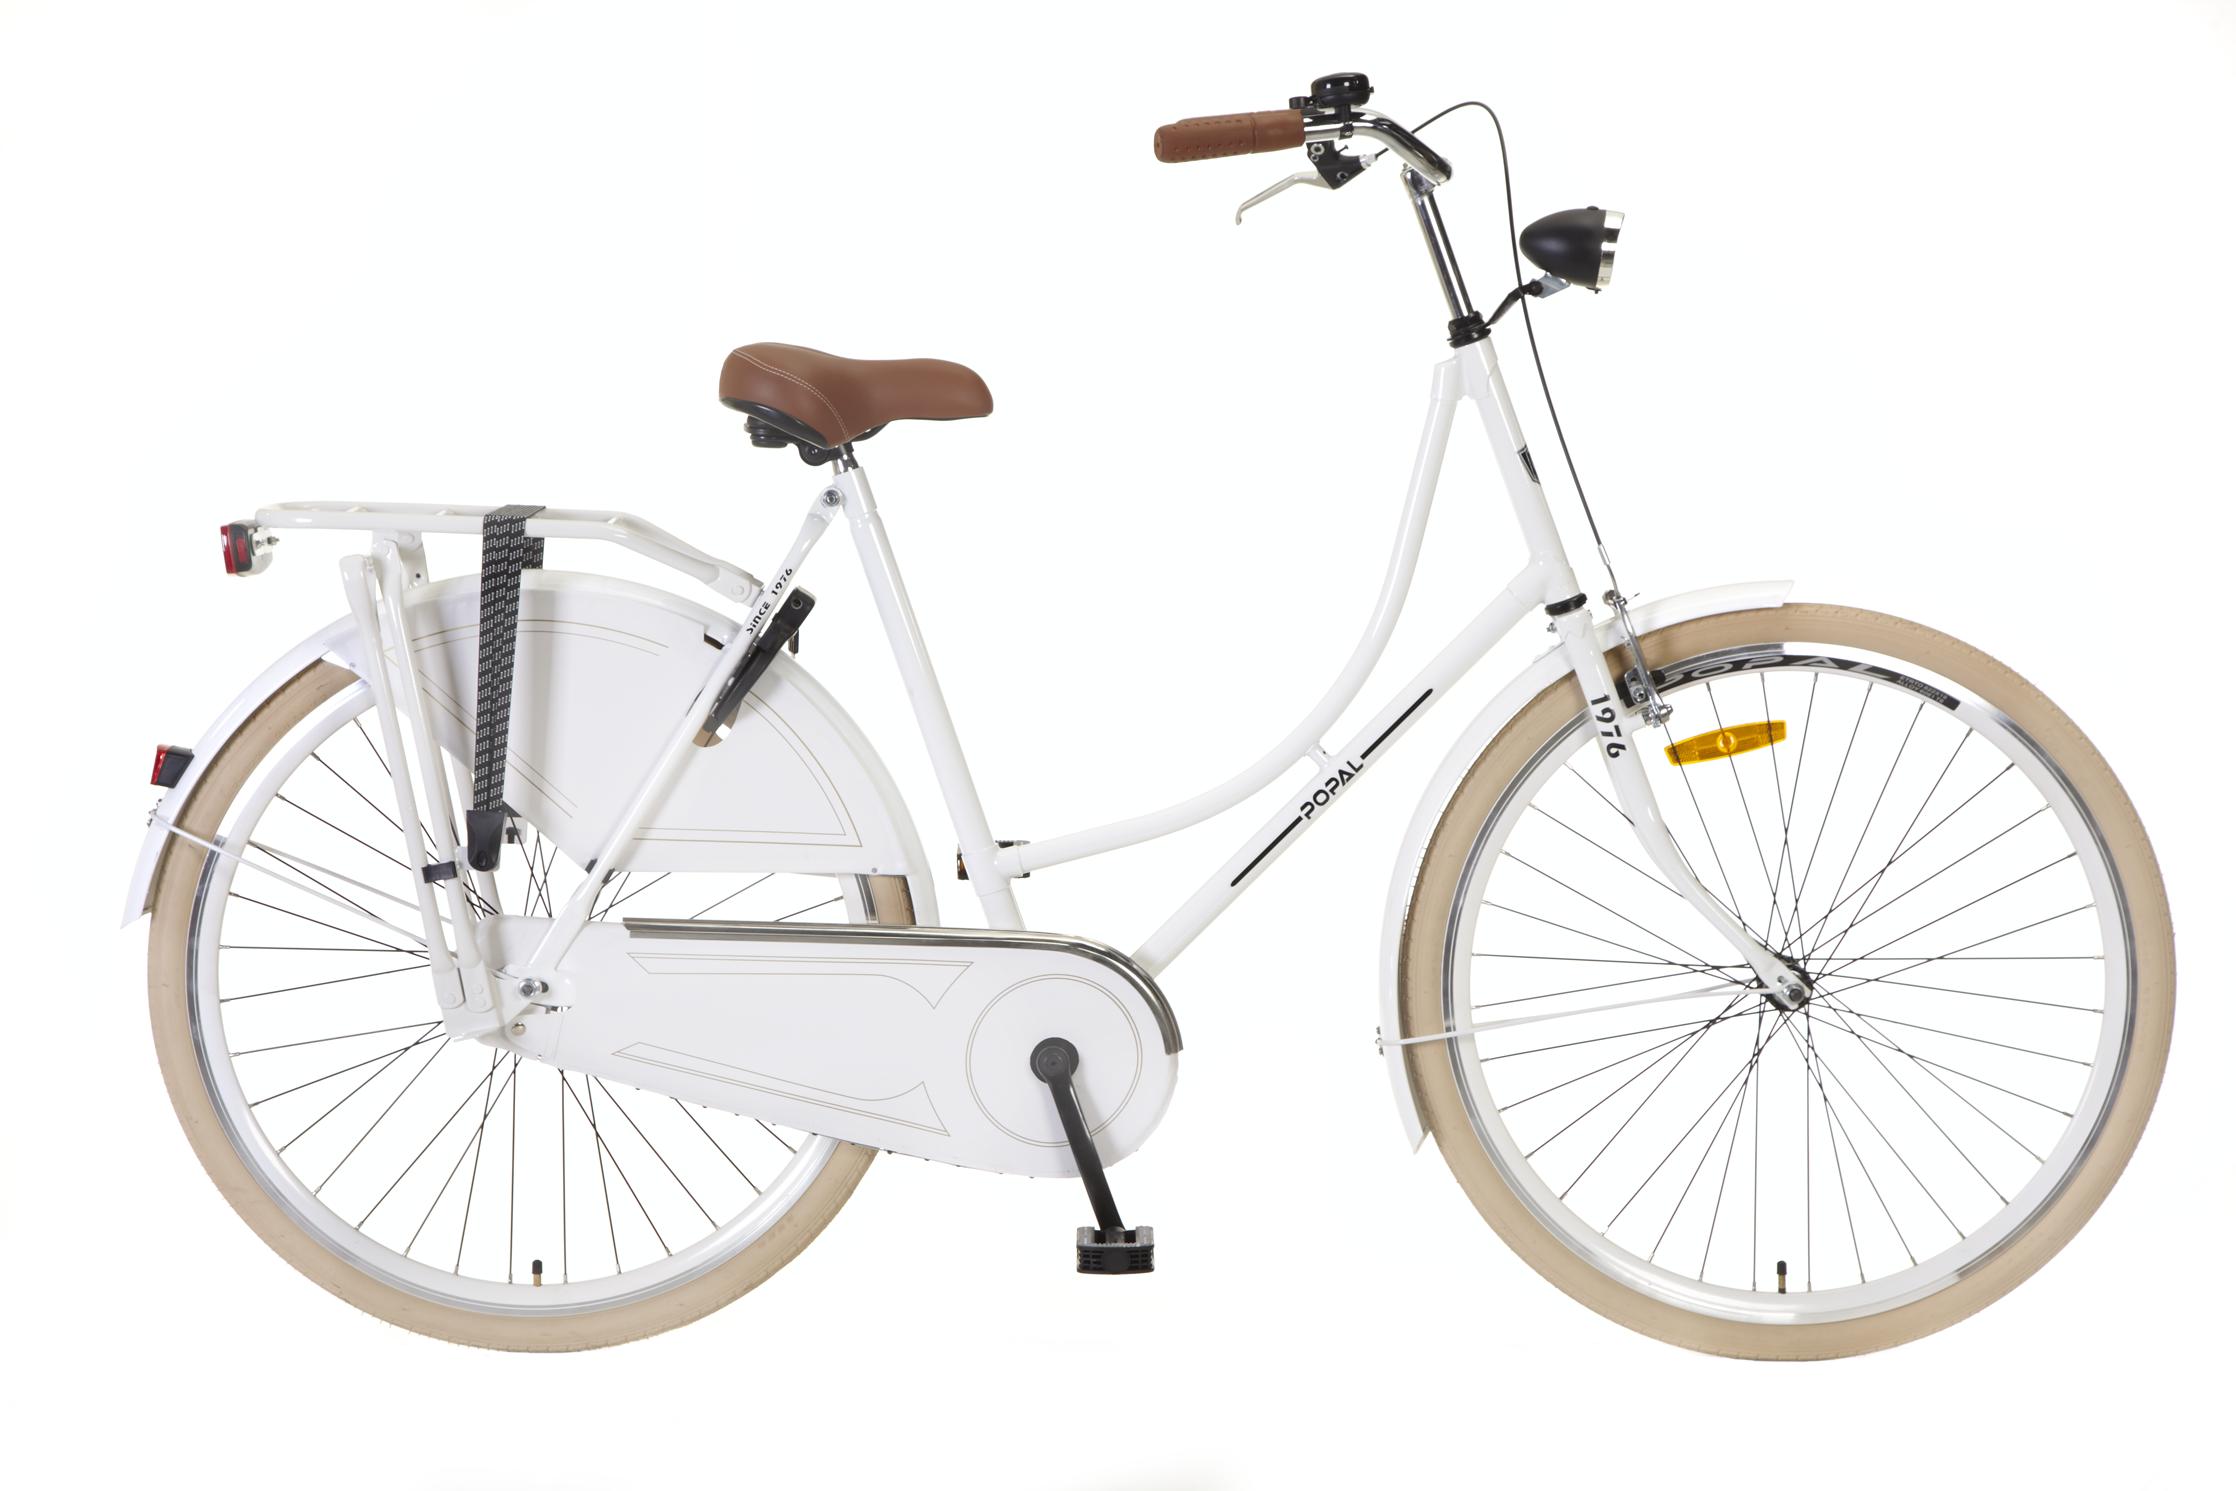 fahrrad damenrad hollandrad 28 zoll mit licht in verschiedenen farben ebay. Black Bedroom Furniture Sets. Home Design Ideas